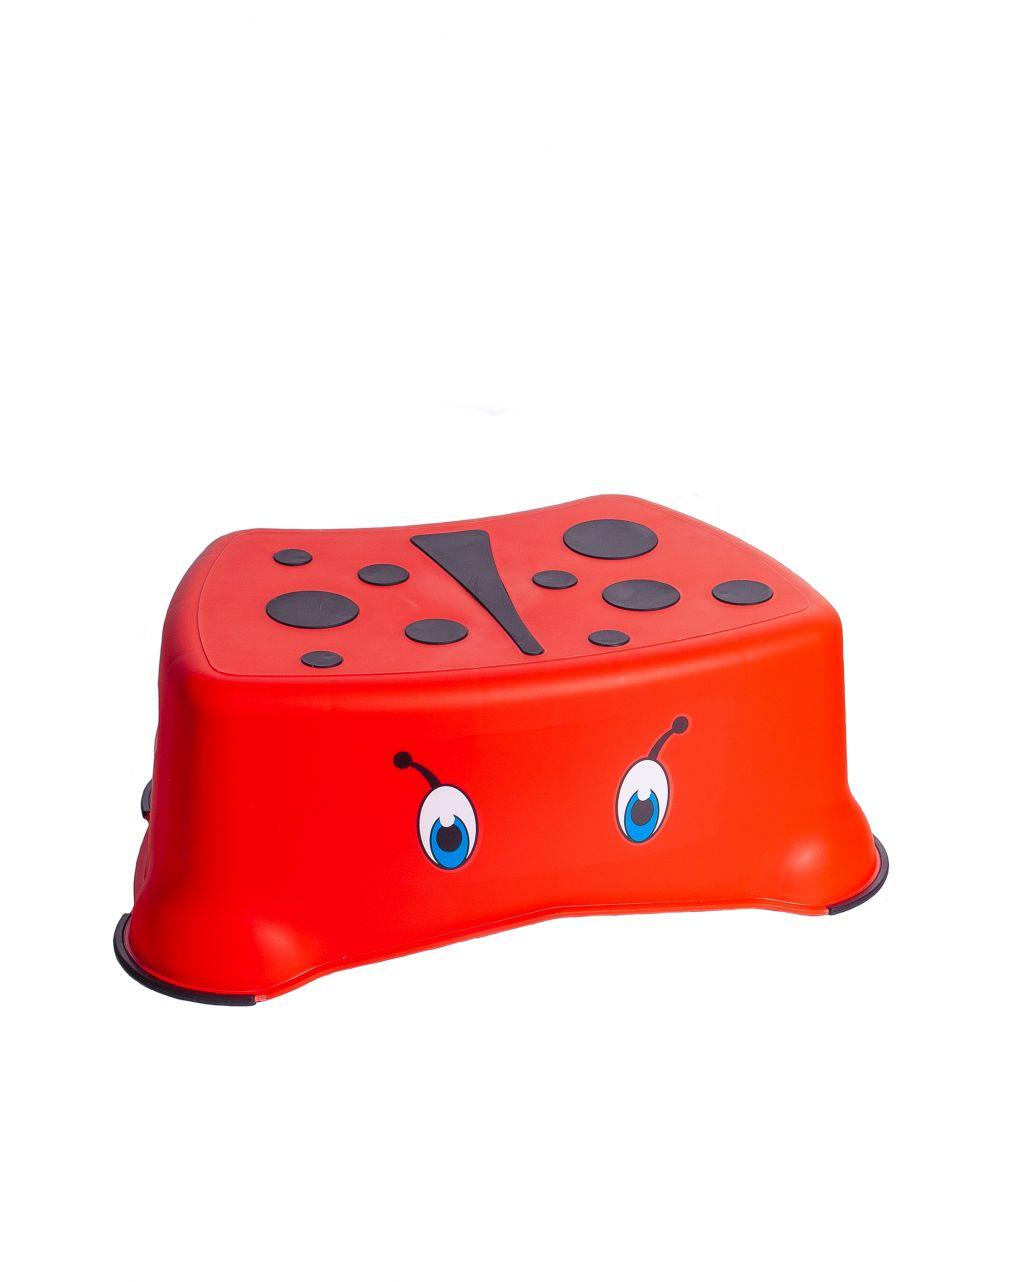 Mcp pedana ladybug - Giordani